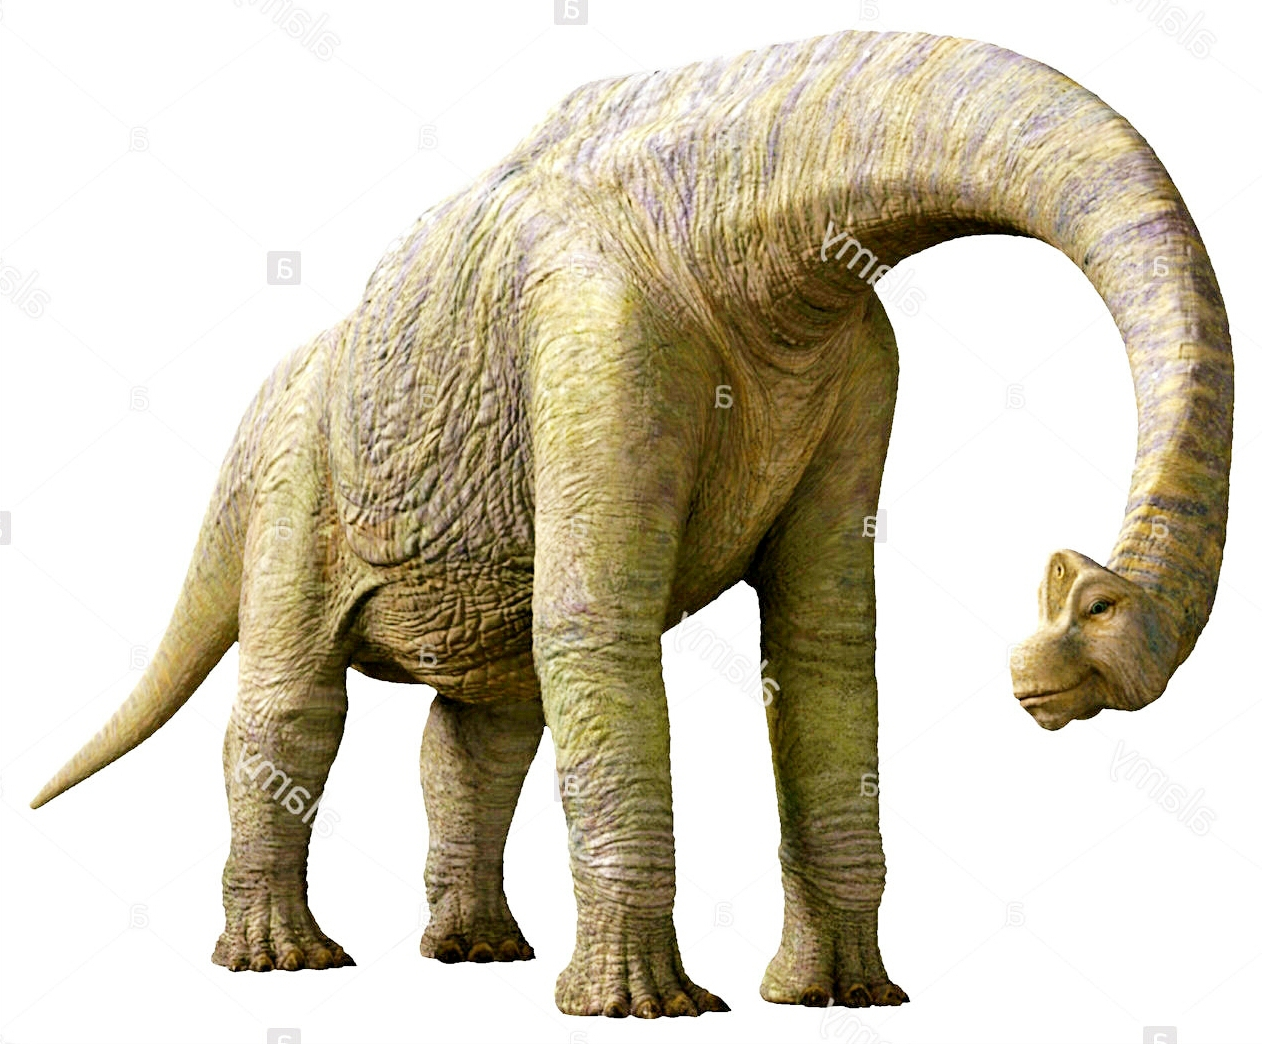 Baylene the Brachiosaurus by QWoodLand on DeviantArt